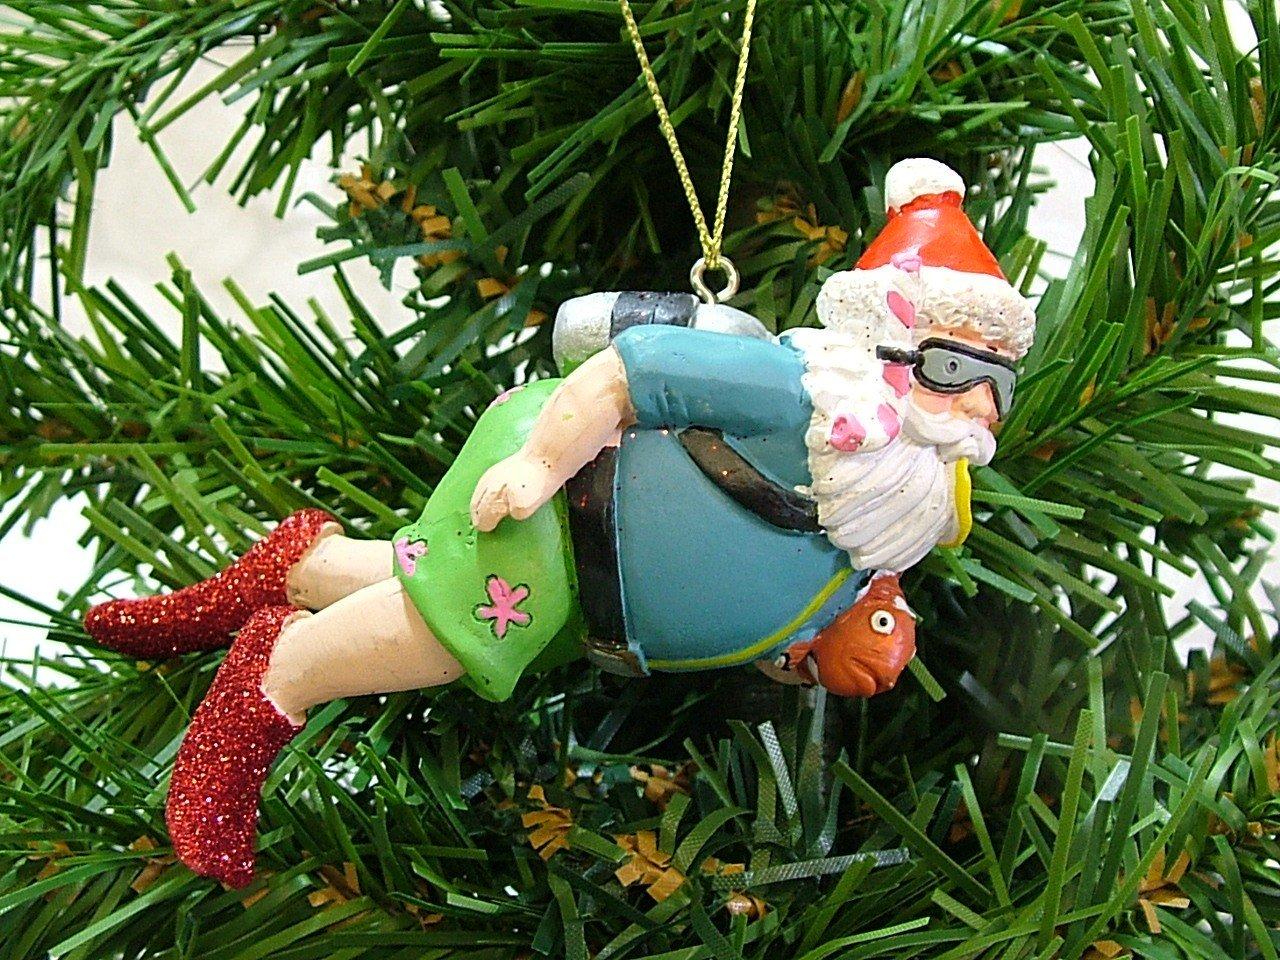 Amazon.com: Scuba Diving Snorkle Swimming Santa Claus Christmas ...